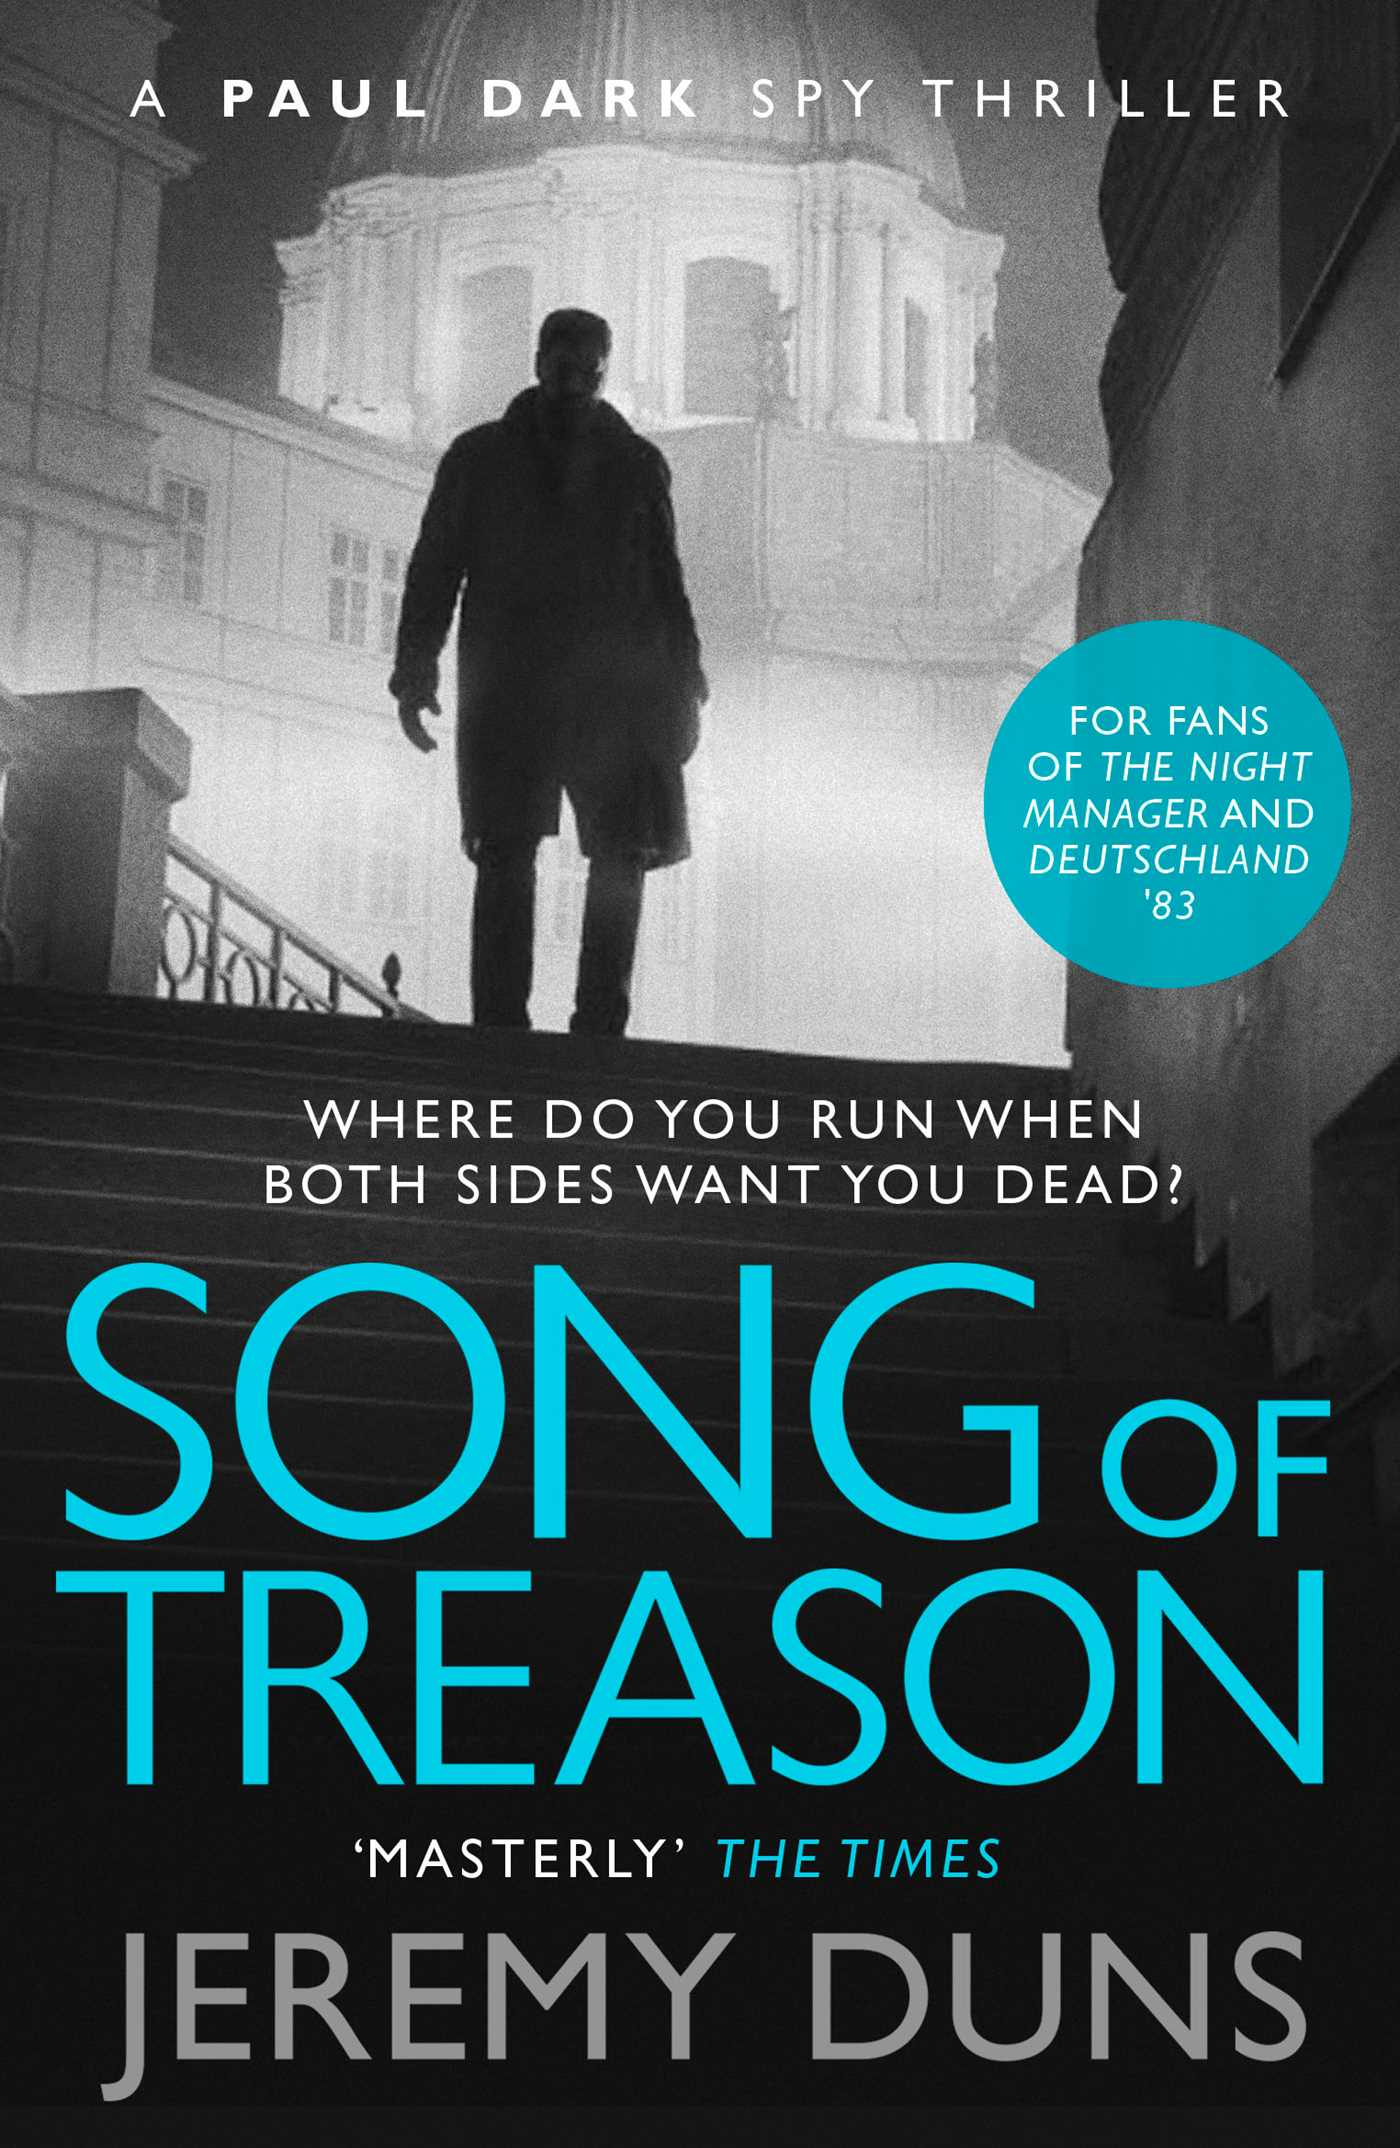 song-of-treason-9781847394521_hr.jpg